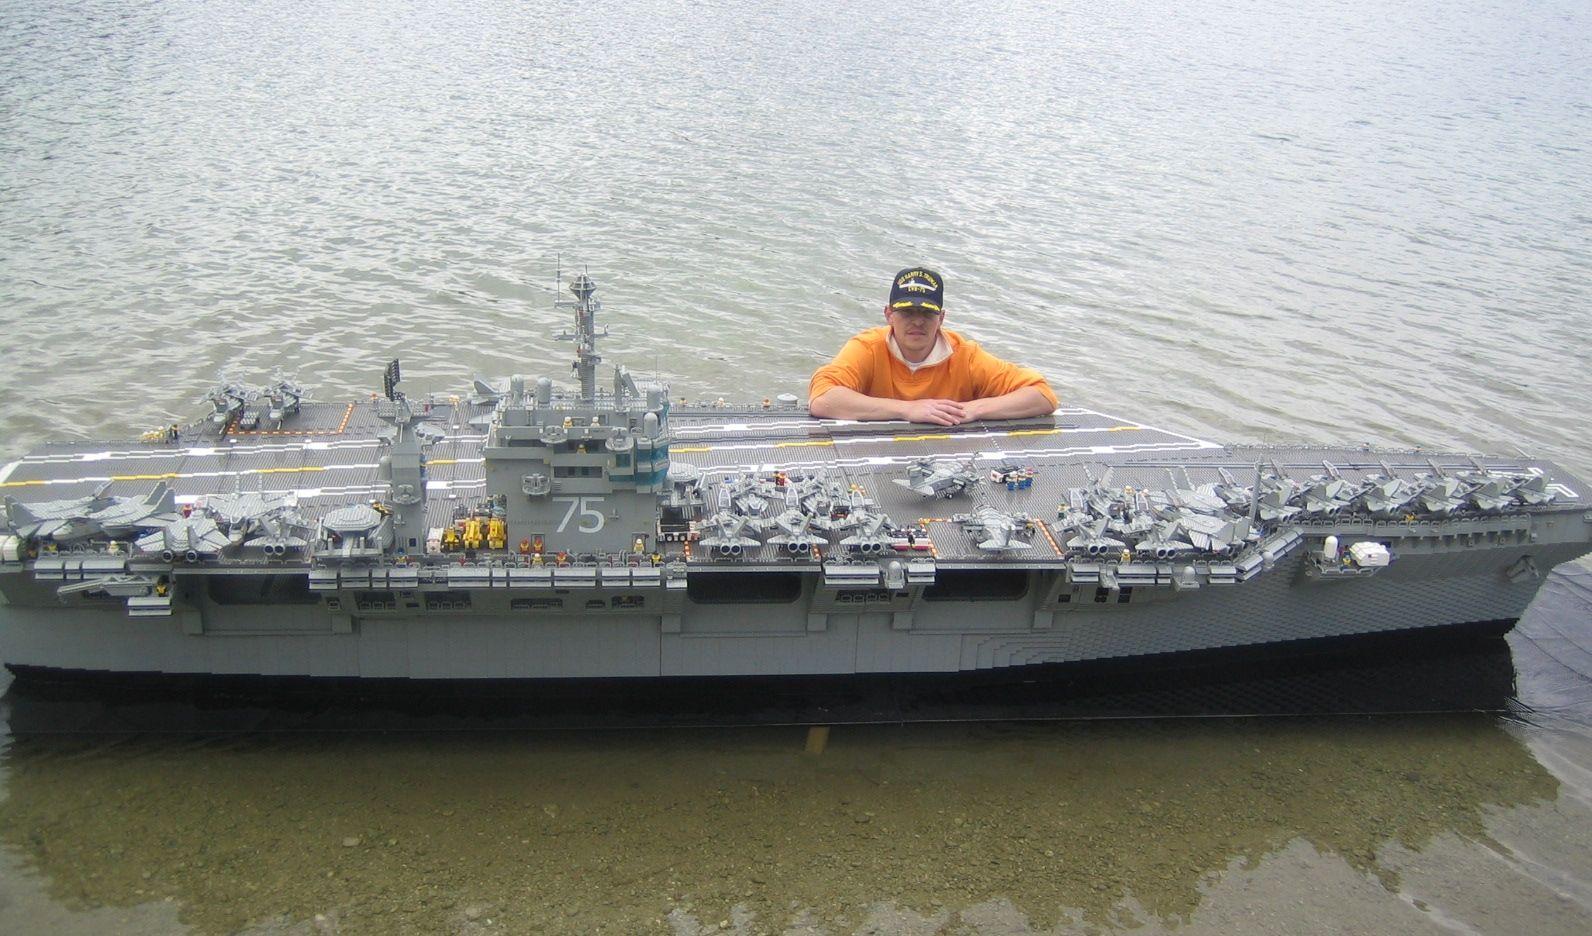 Lego Aircraft Carrier - MyConfinedSpace